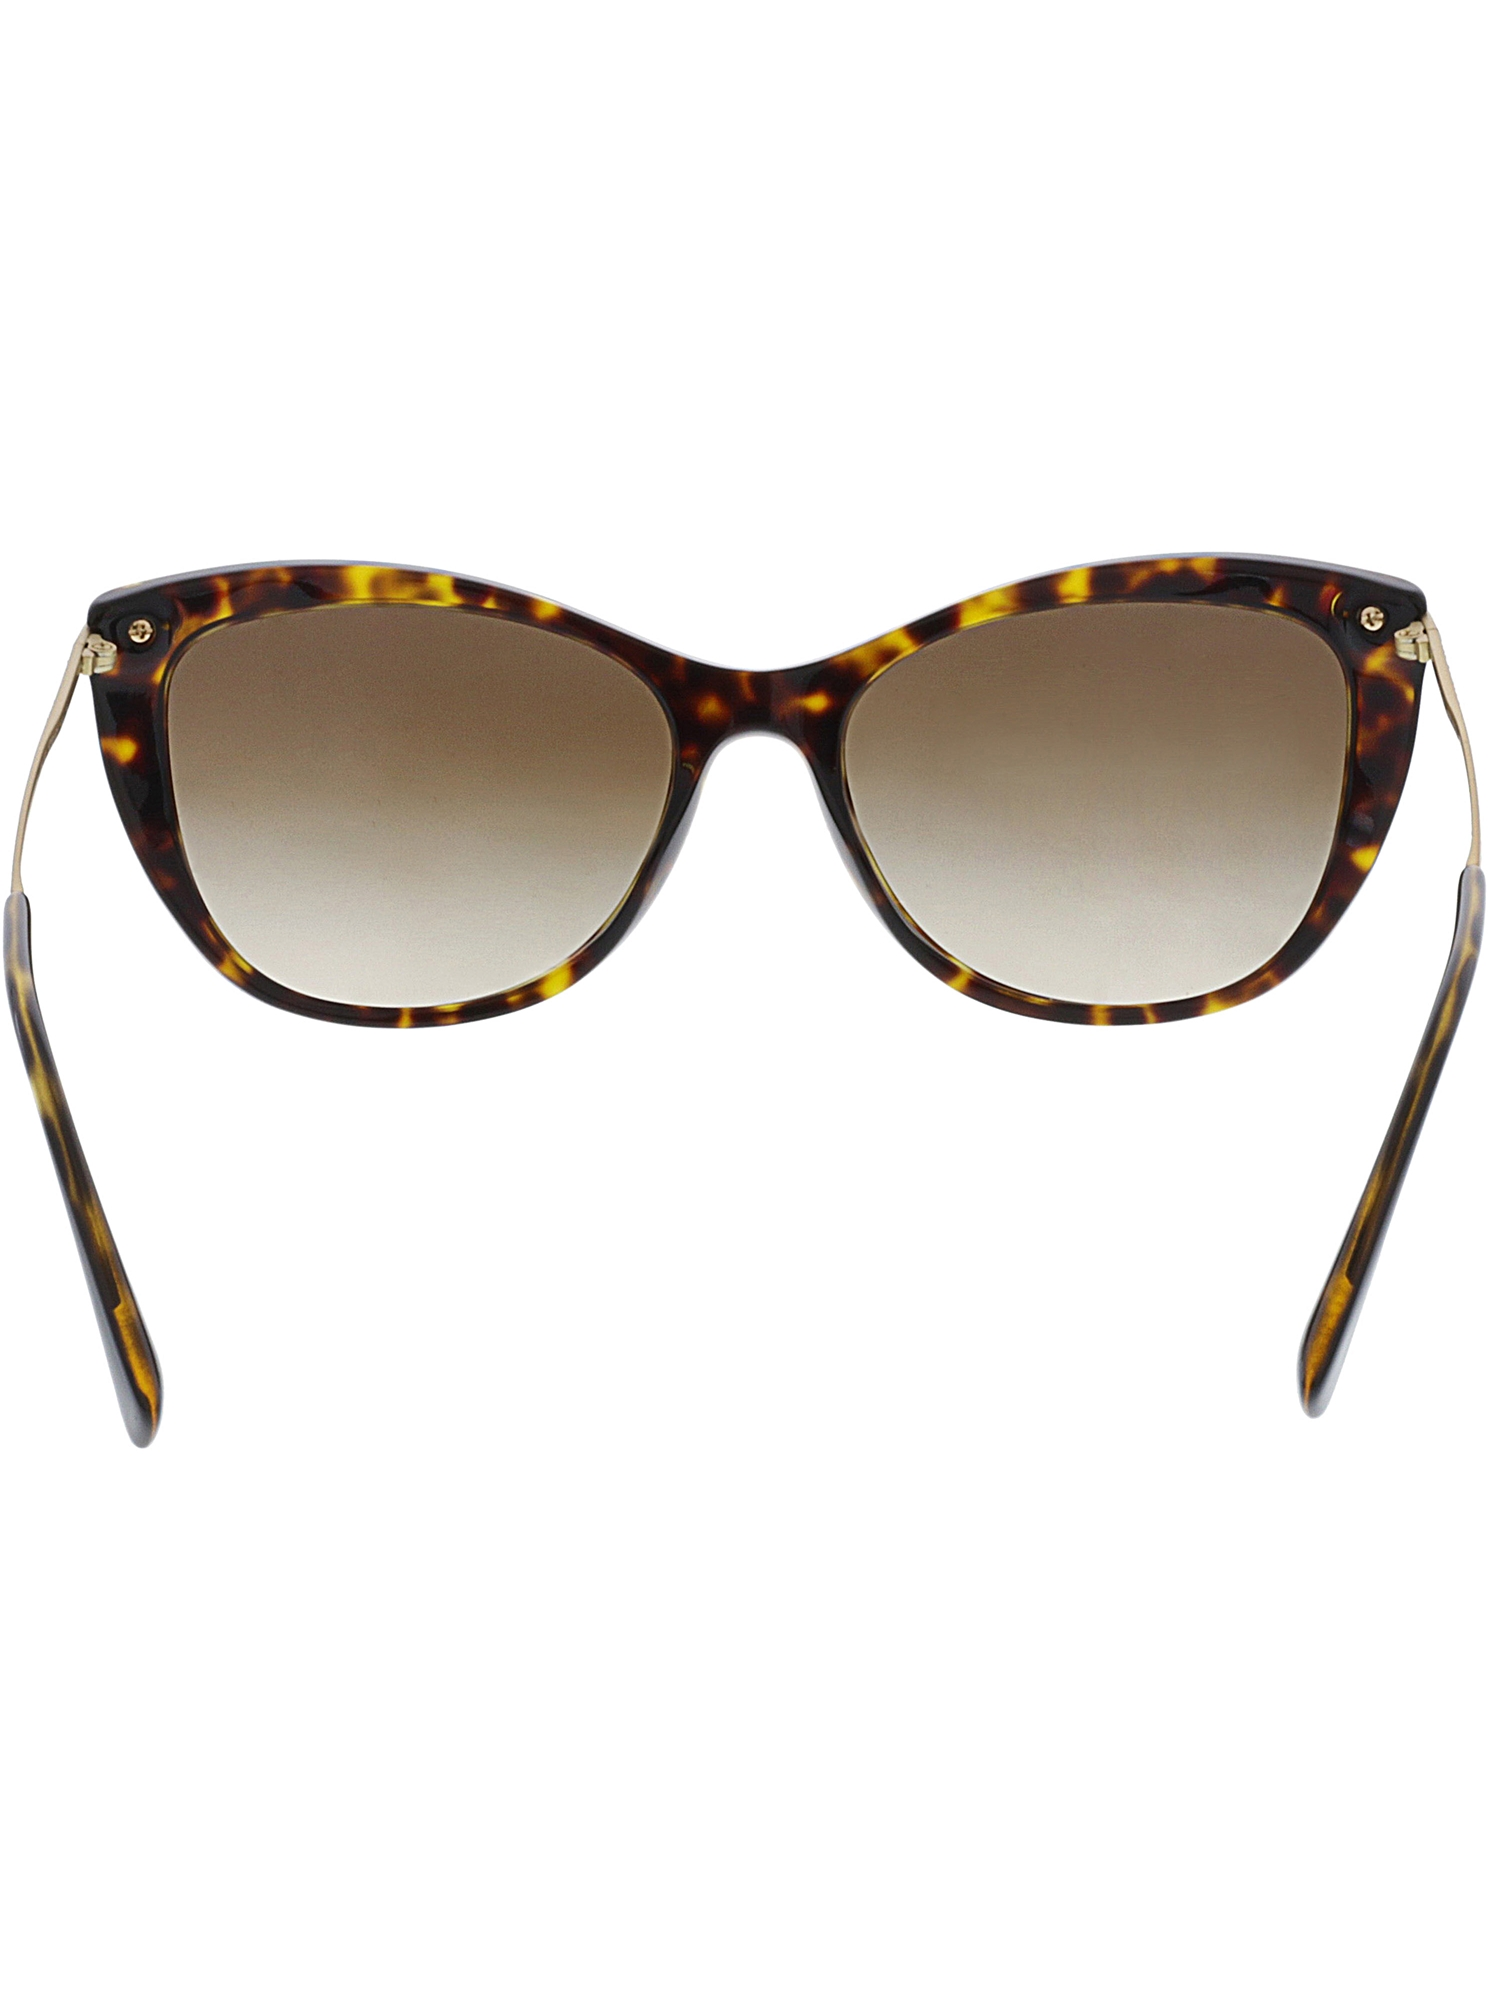 79d50f61f3 Versace - Versace Women s Gradient VE4345B-108 13-57 Brown Butterfly  Sunglasses - Walmart.com